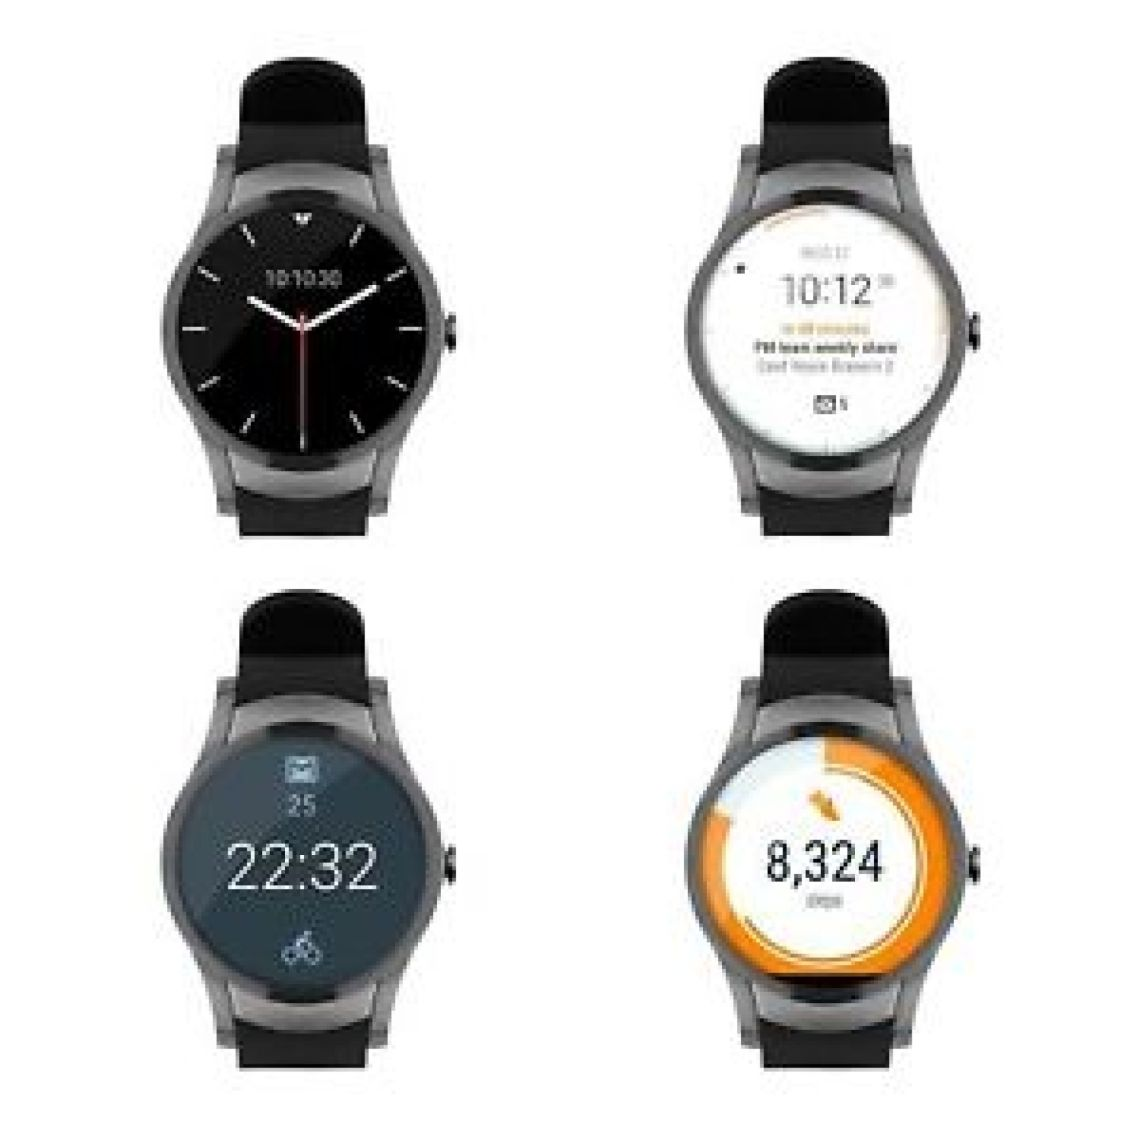 Wear24 Quanta Smartwatch by Verizon 42mm WiFi + Bluetooth Android Wear 2.0 | eBay